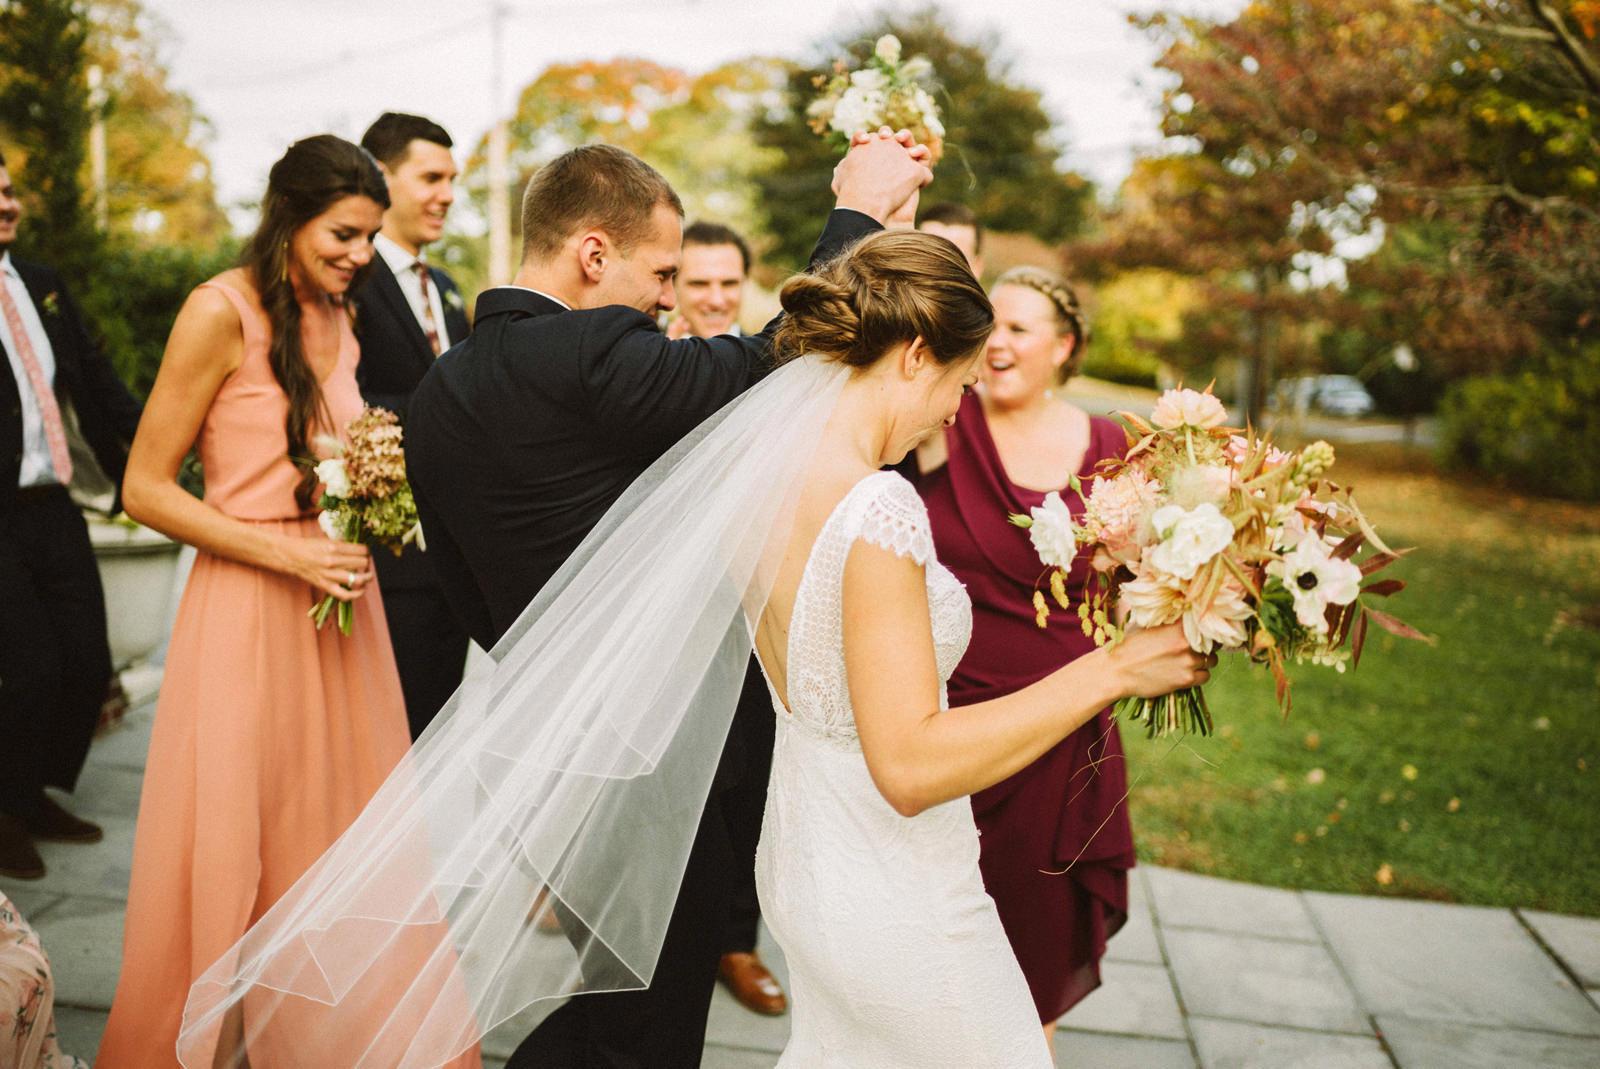 bridgeport-wedding-084 BRIDGEPORT, CONNECTICUT BACKYARD WEDDING